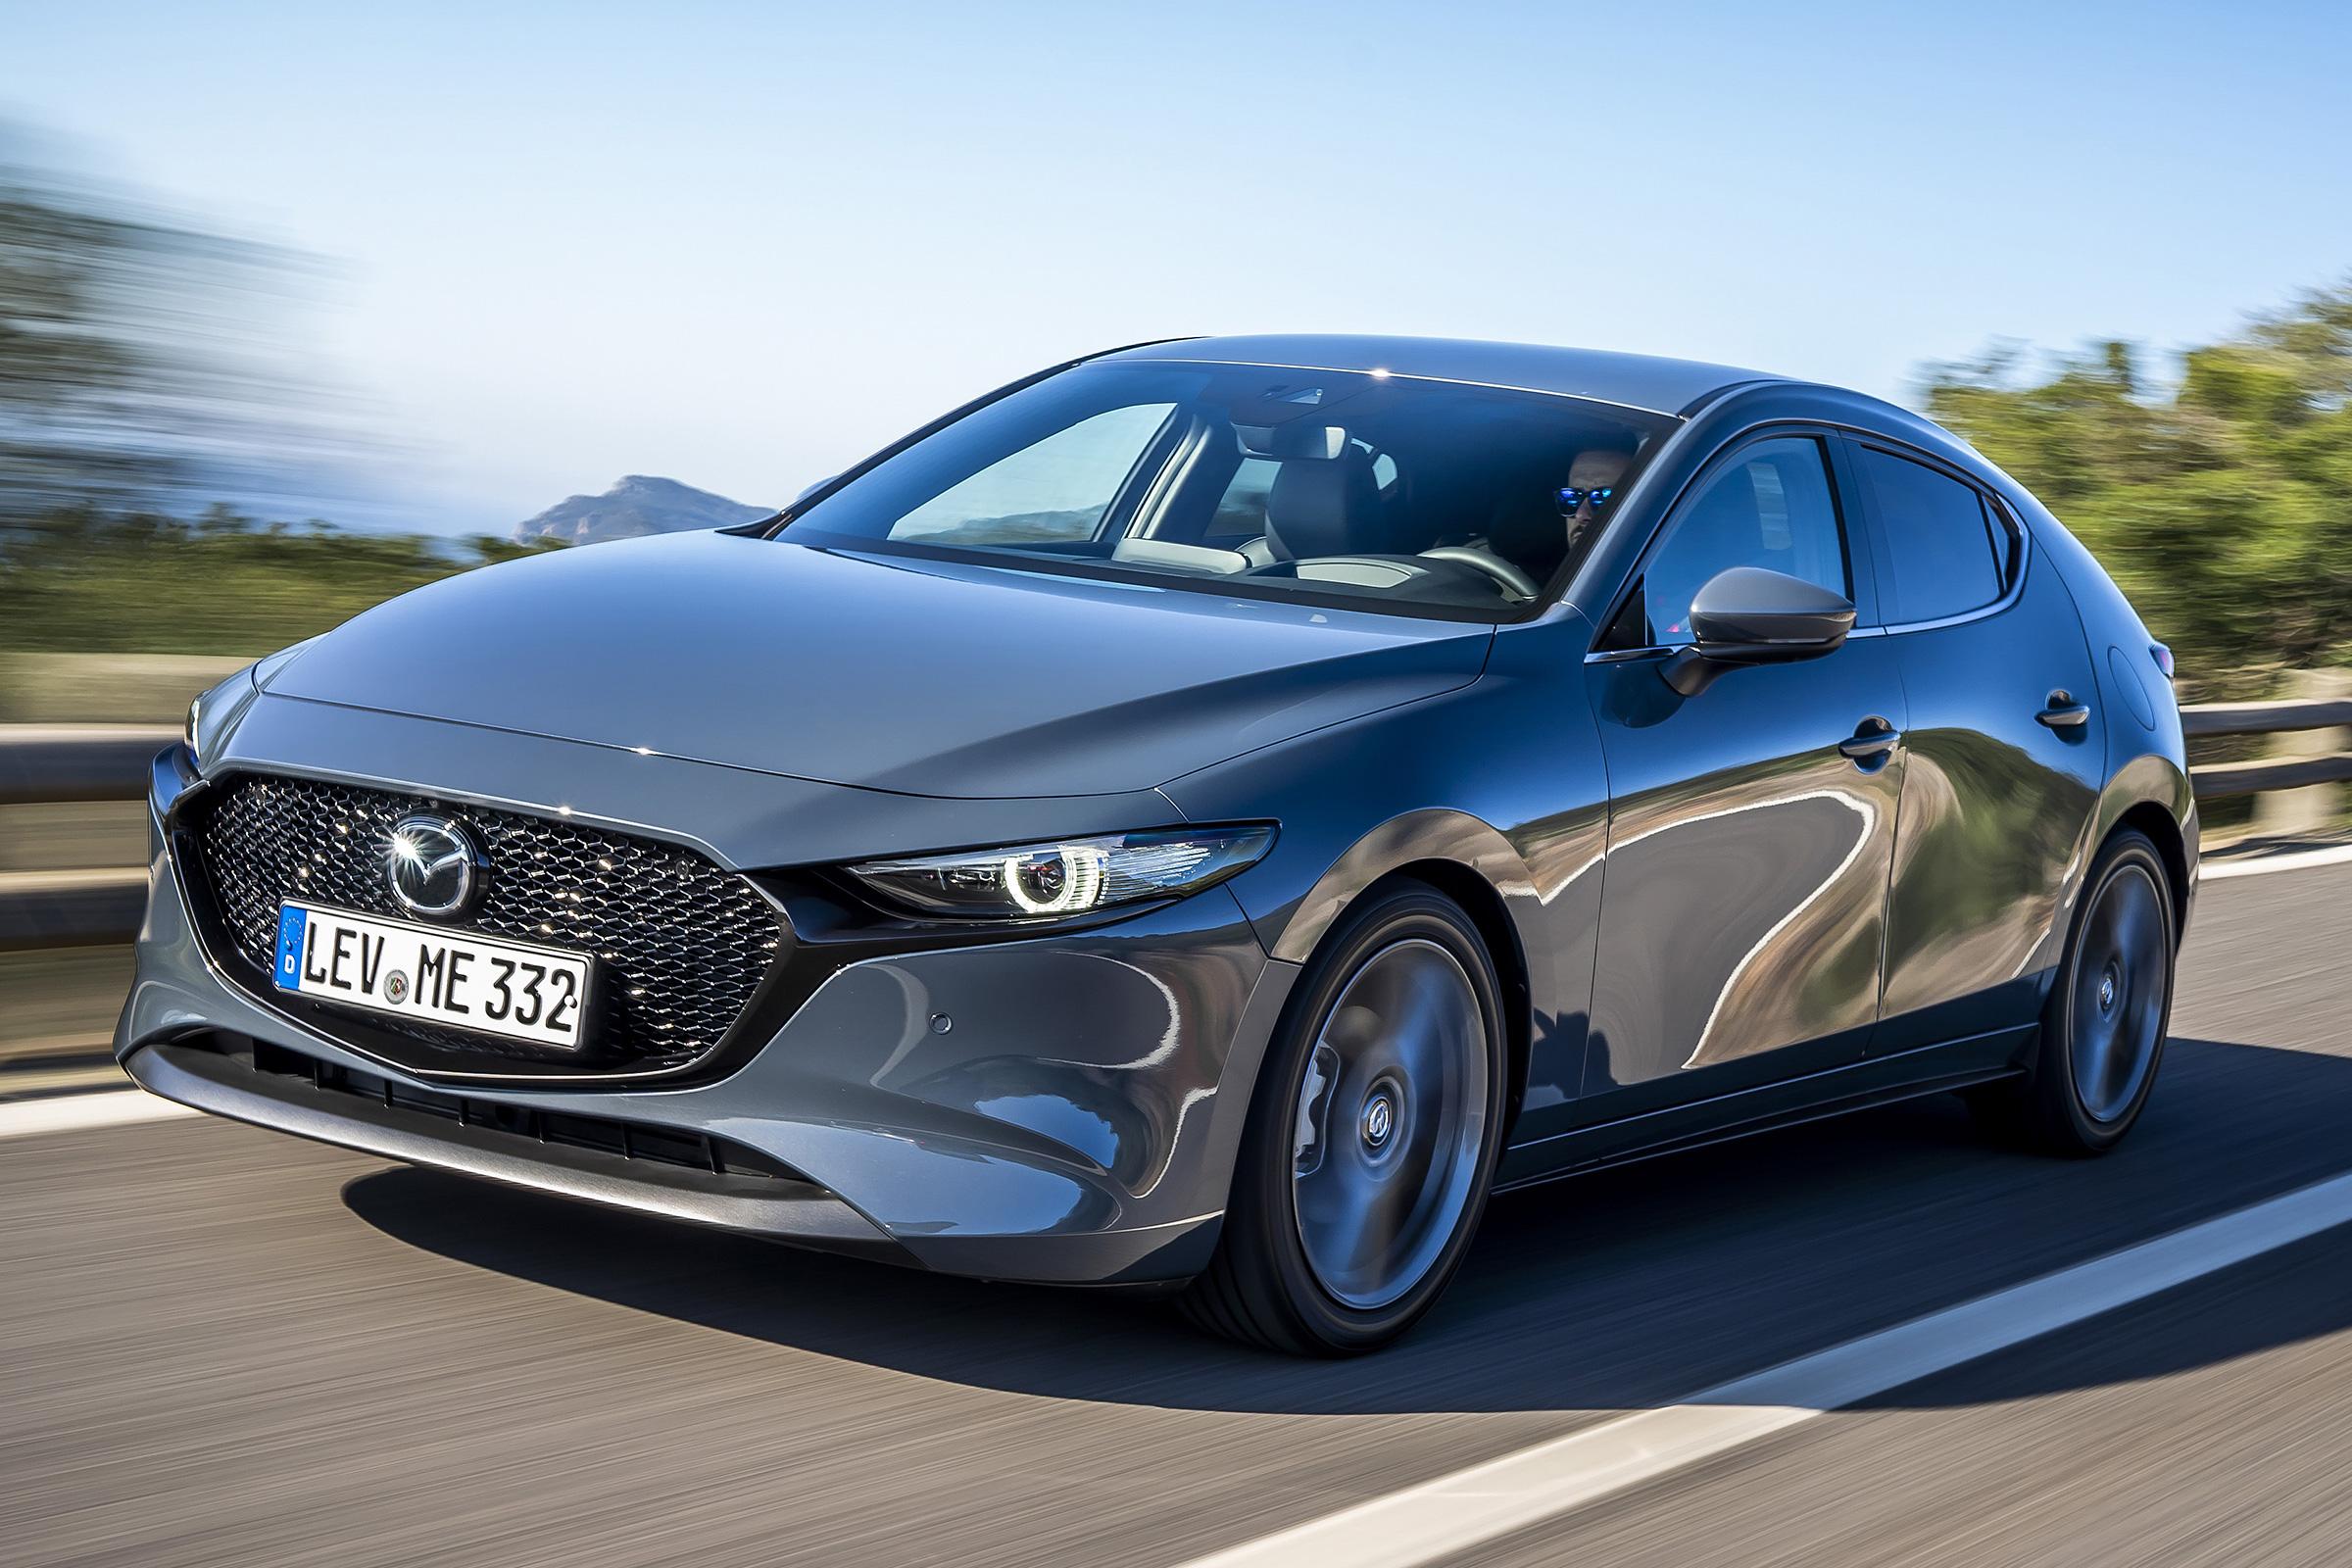 Kelebihan Kekurangan Mazda 3 Diesel Spesifikasi